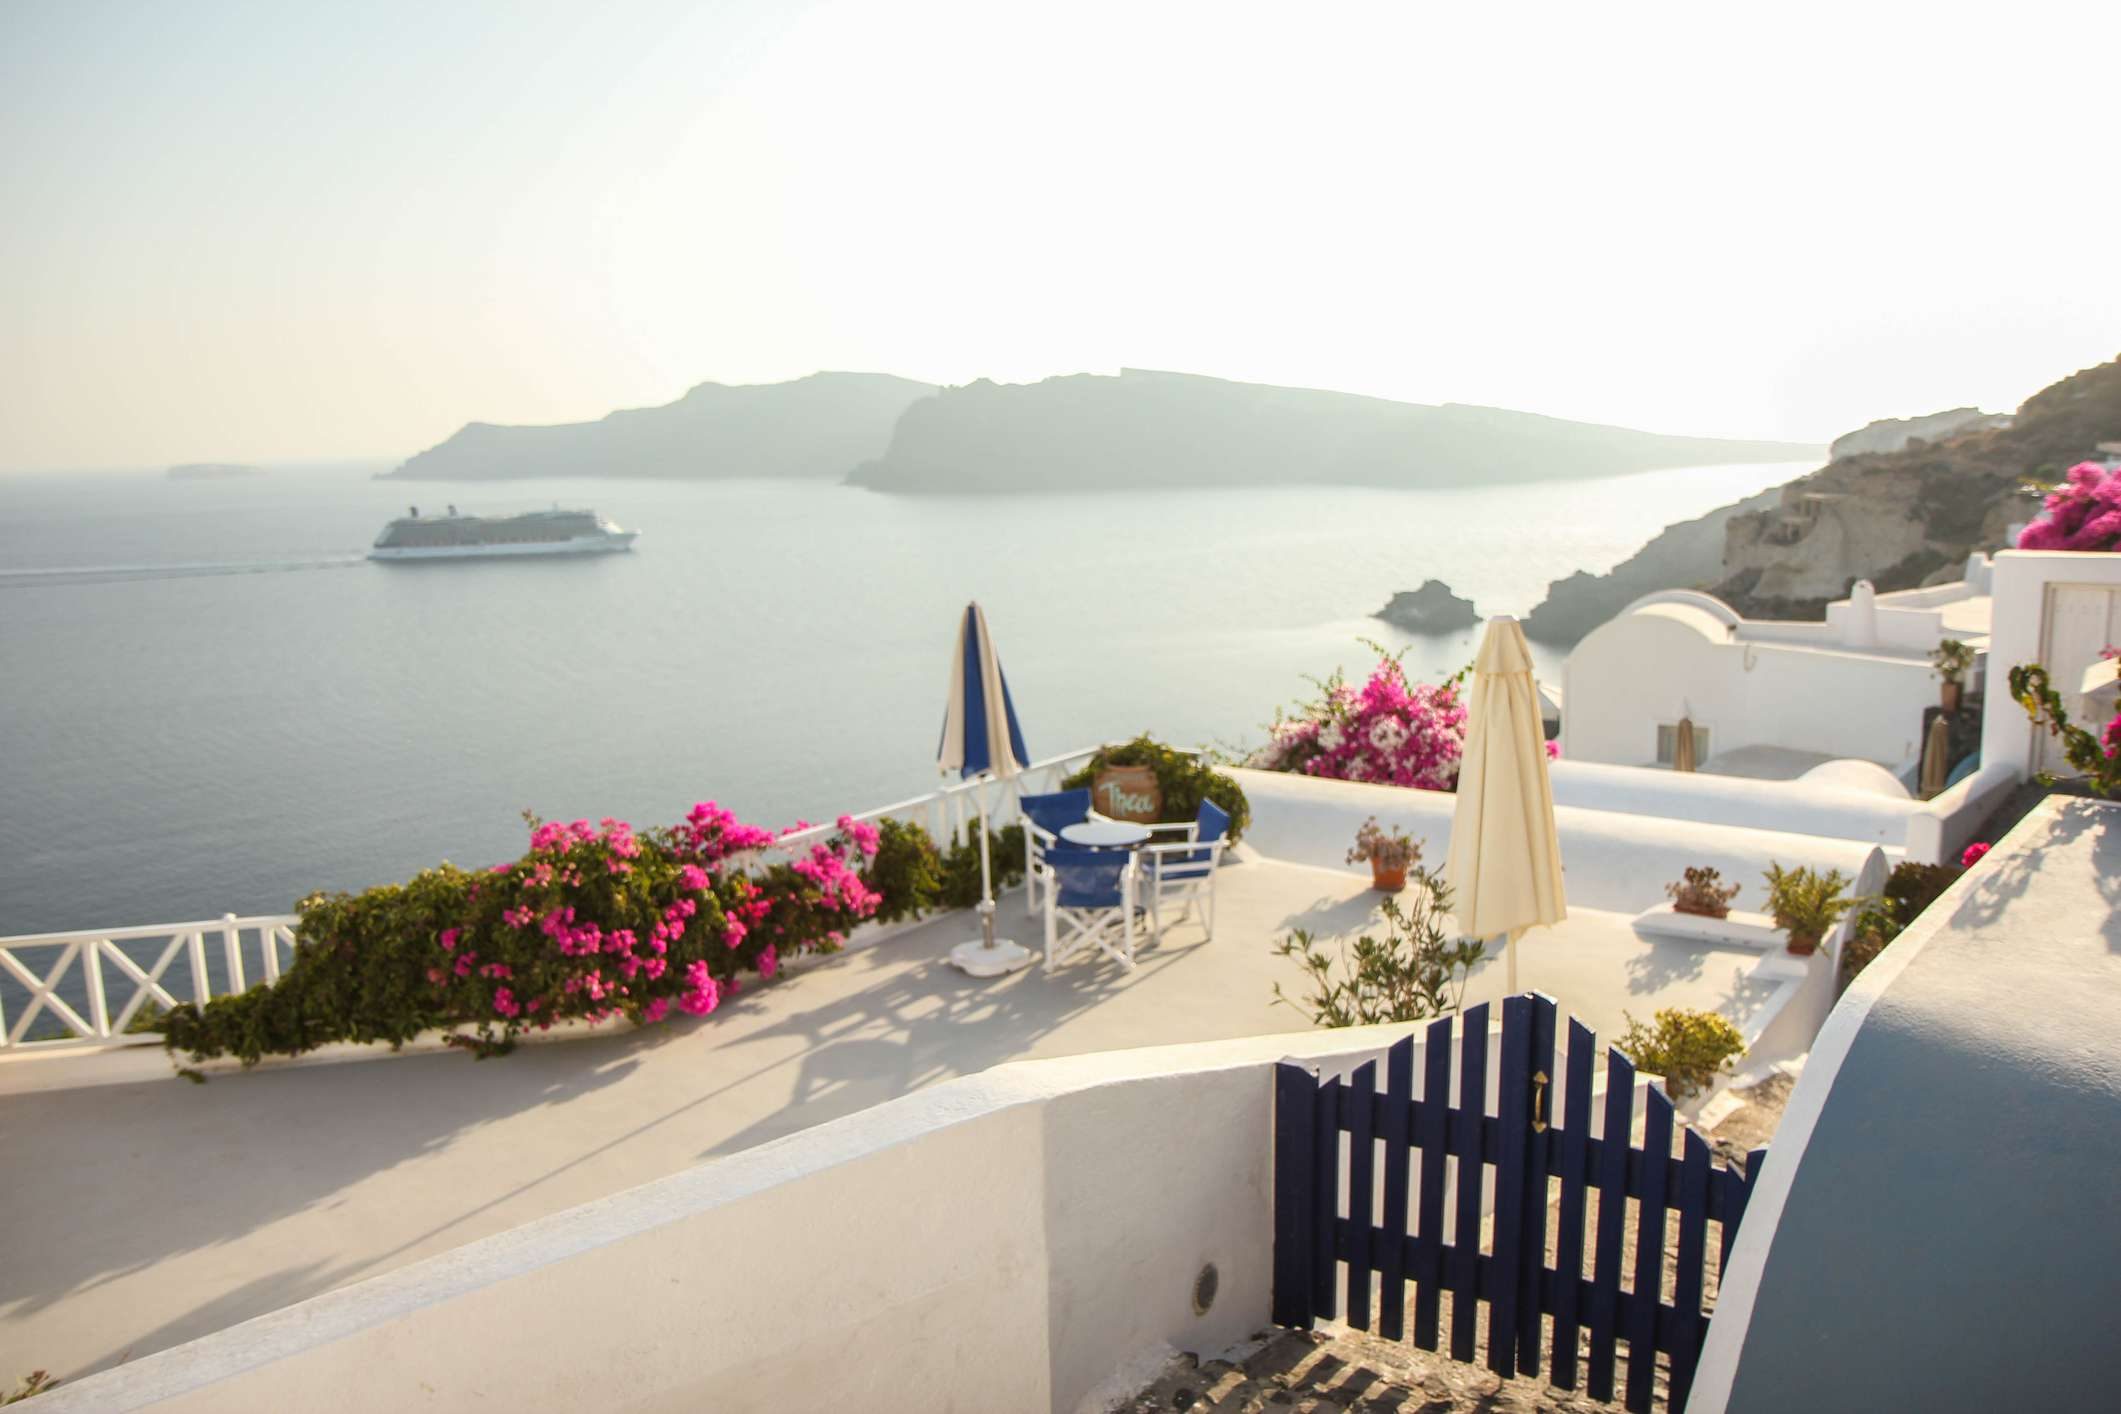 Scenic view from Santorini